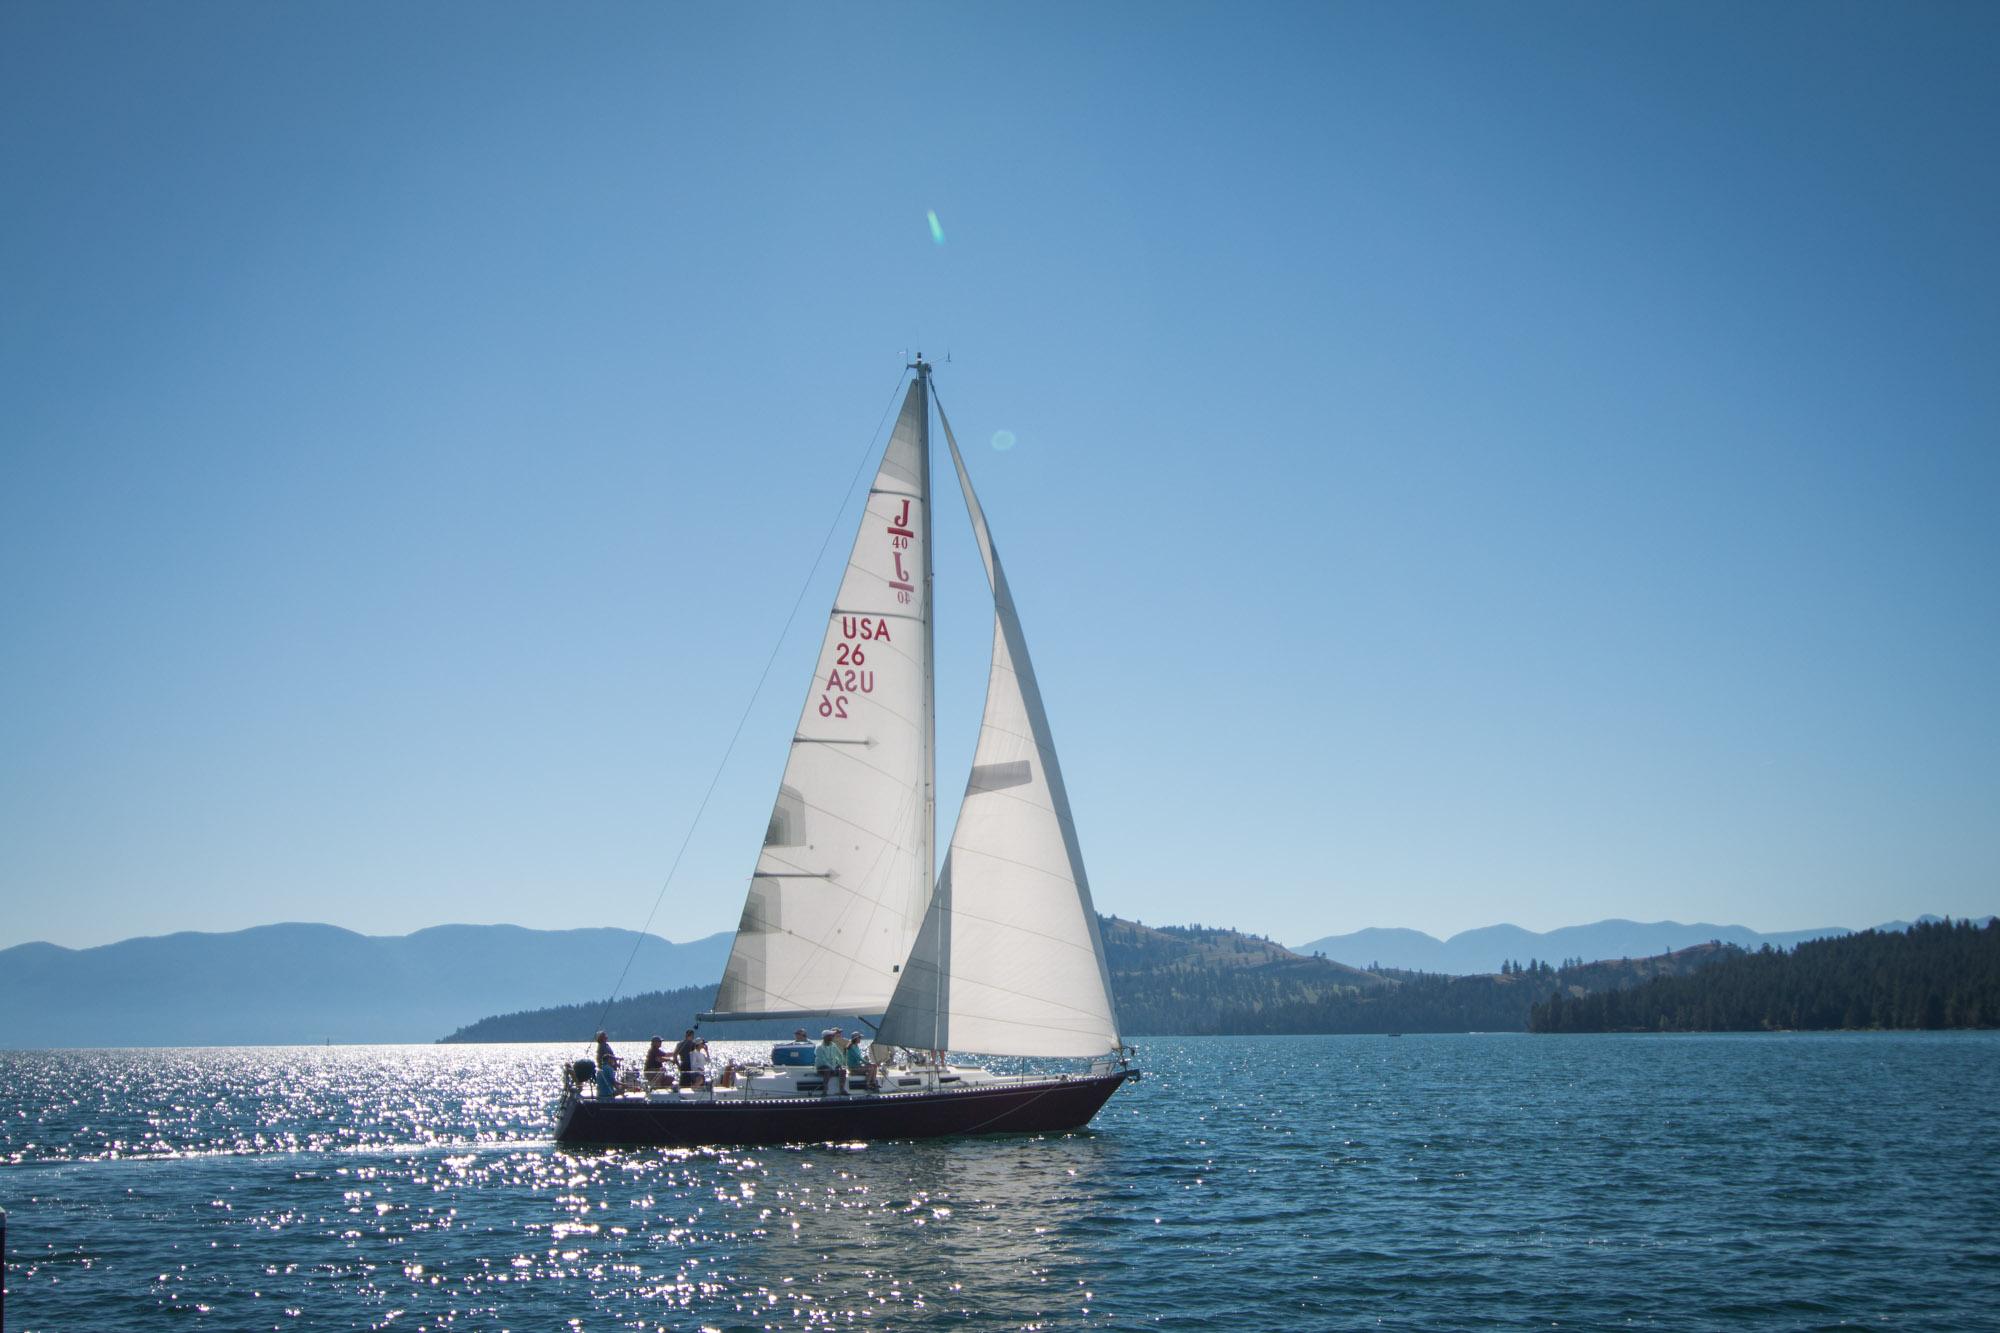 Dad_Sailing-26.jpg